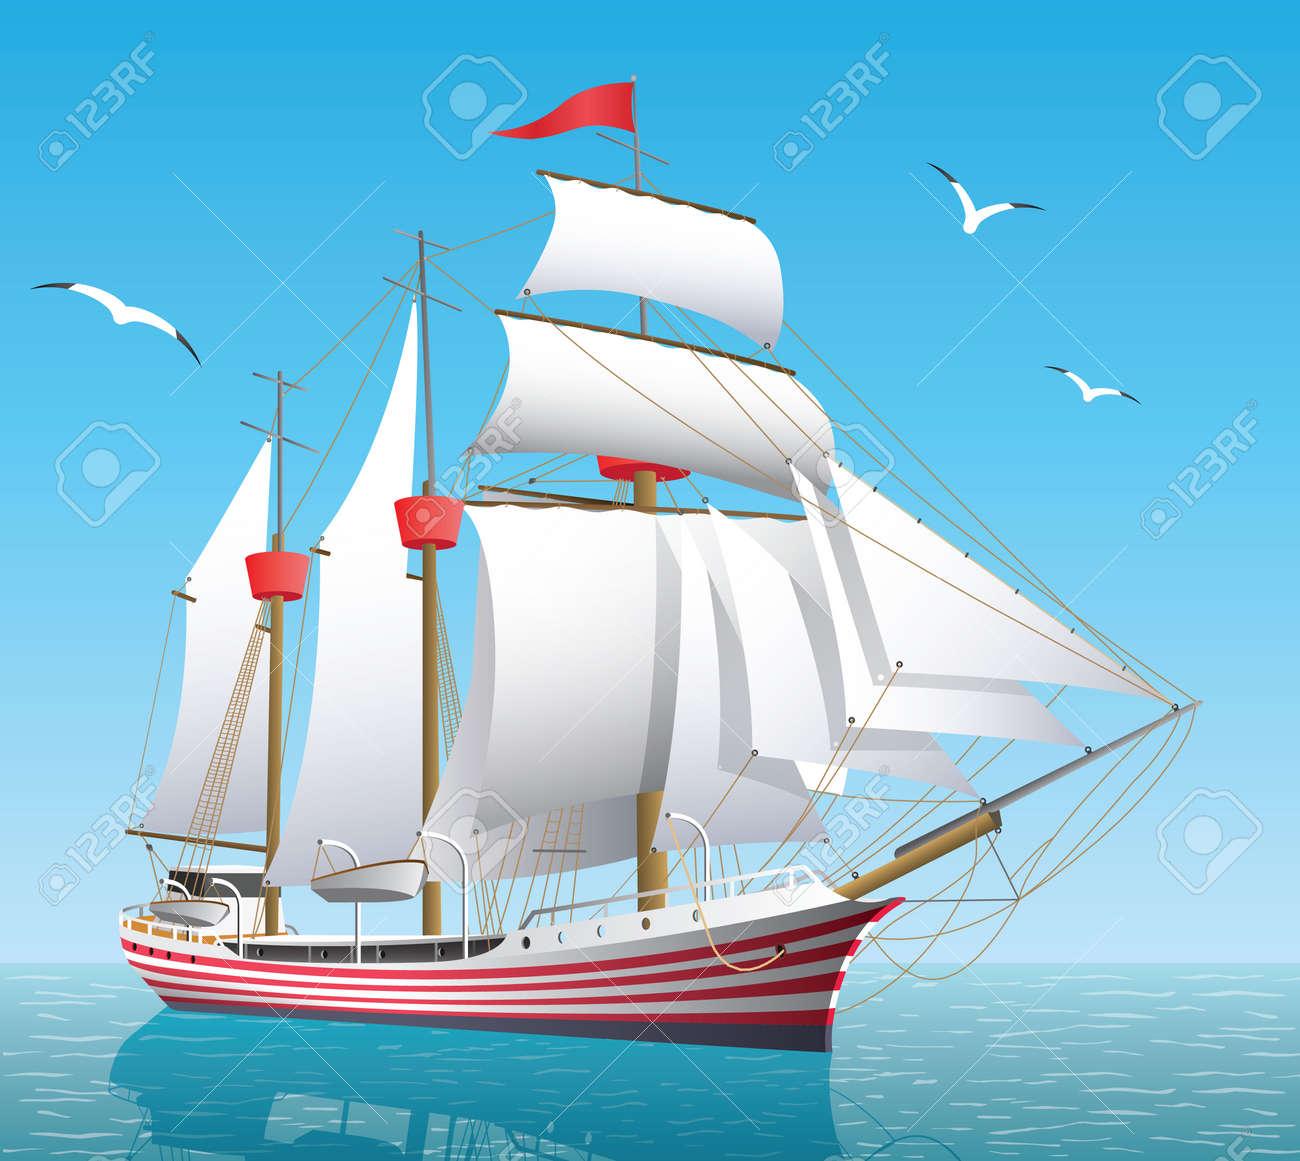 Ship on the open sea - 157069864